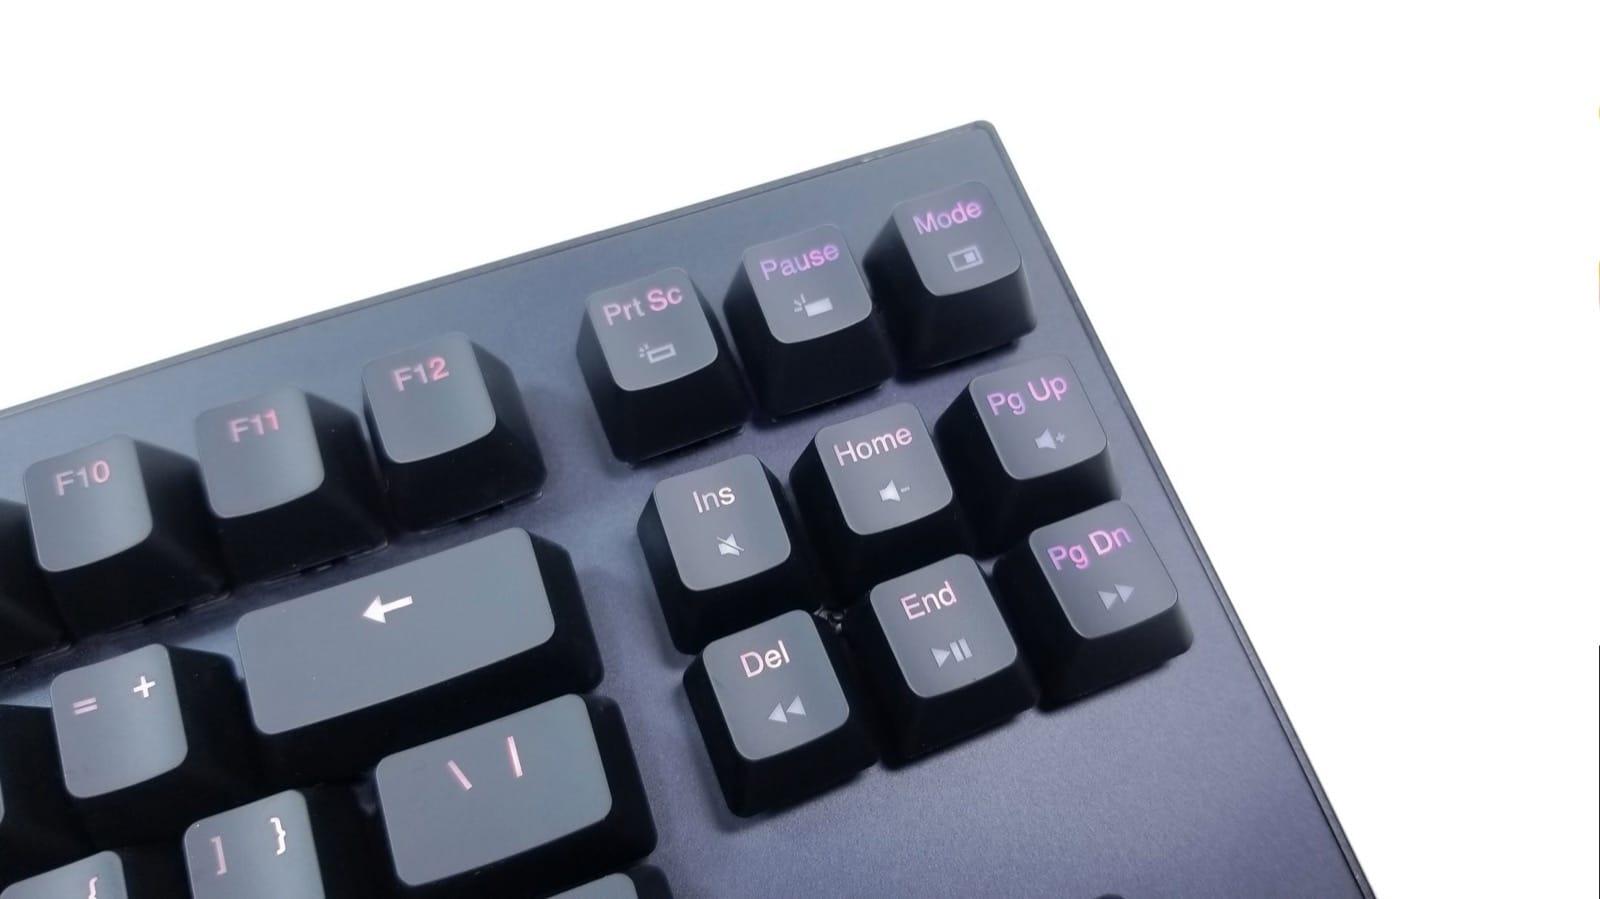 wooting-one-analog-keyboard-review-4-0.jpg